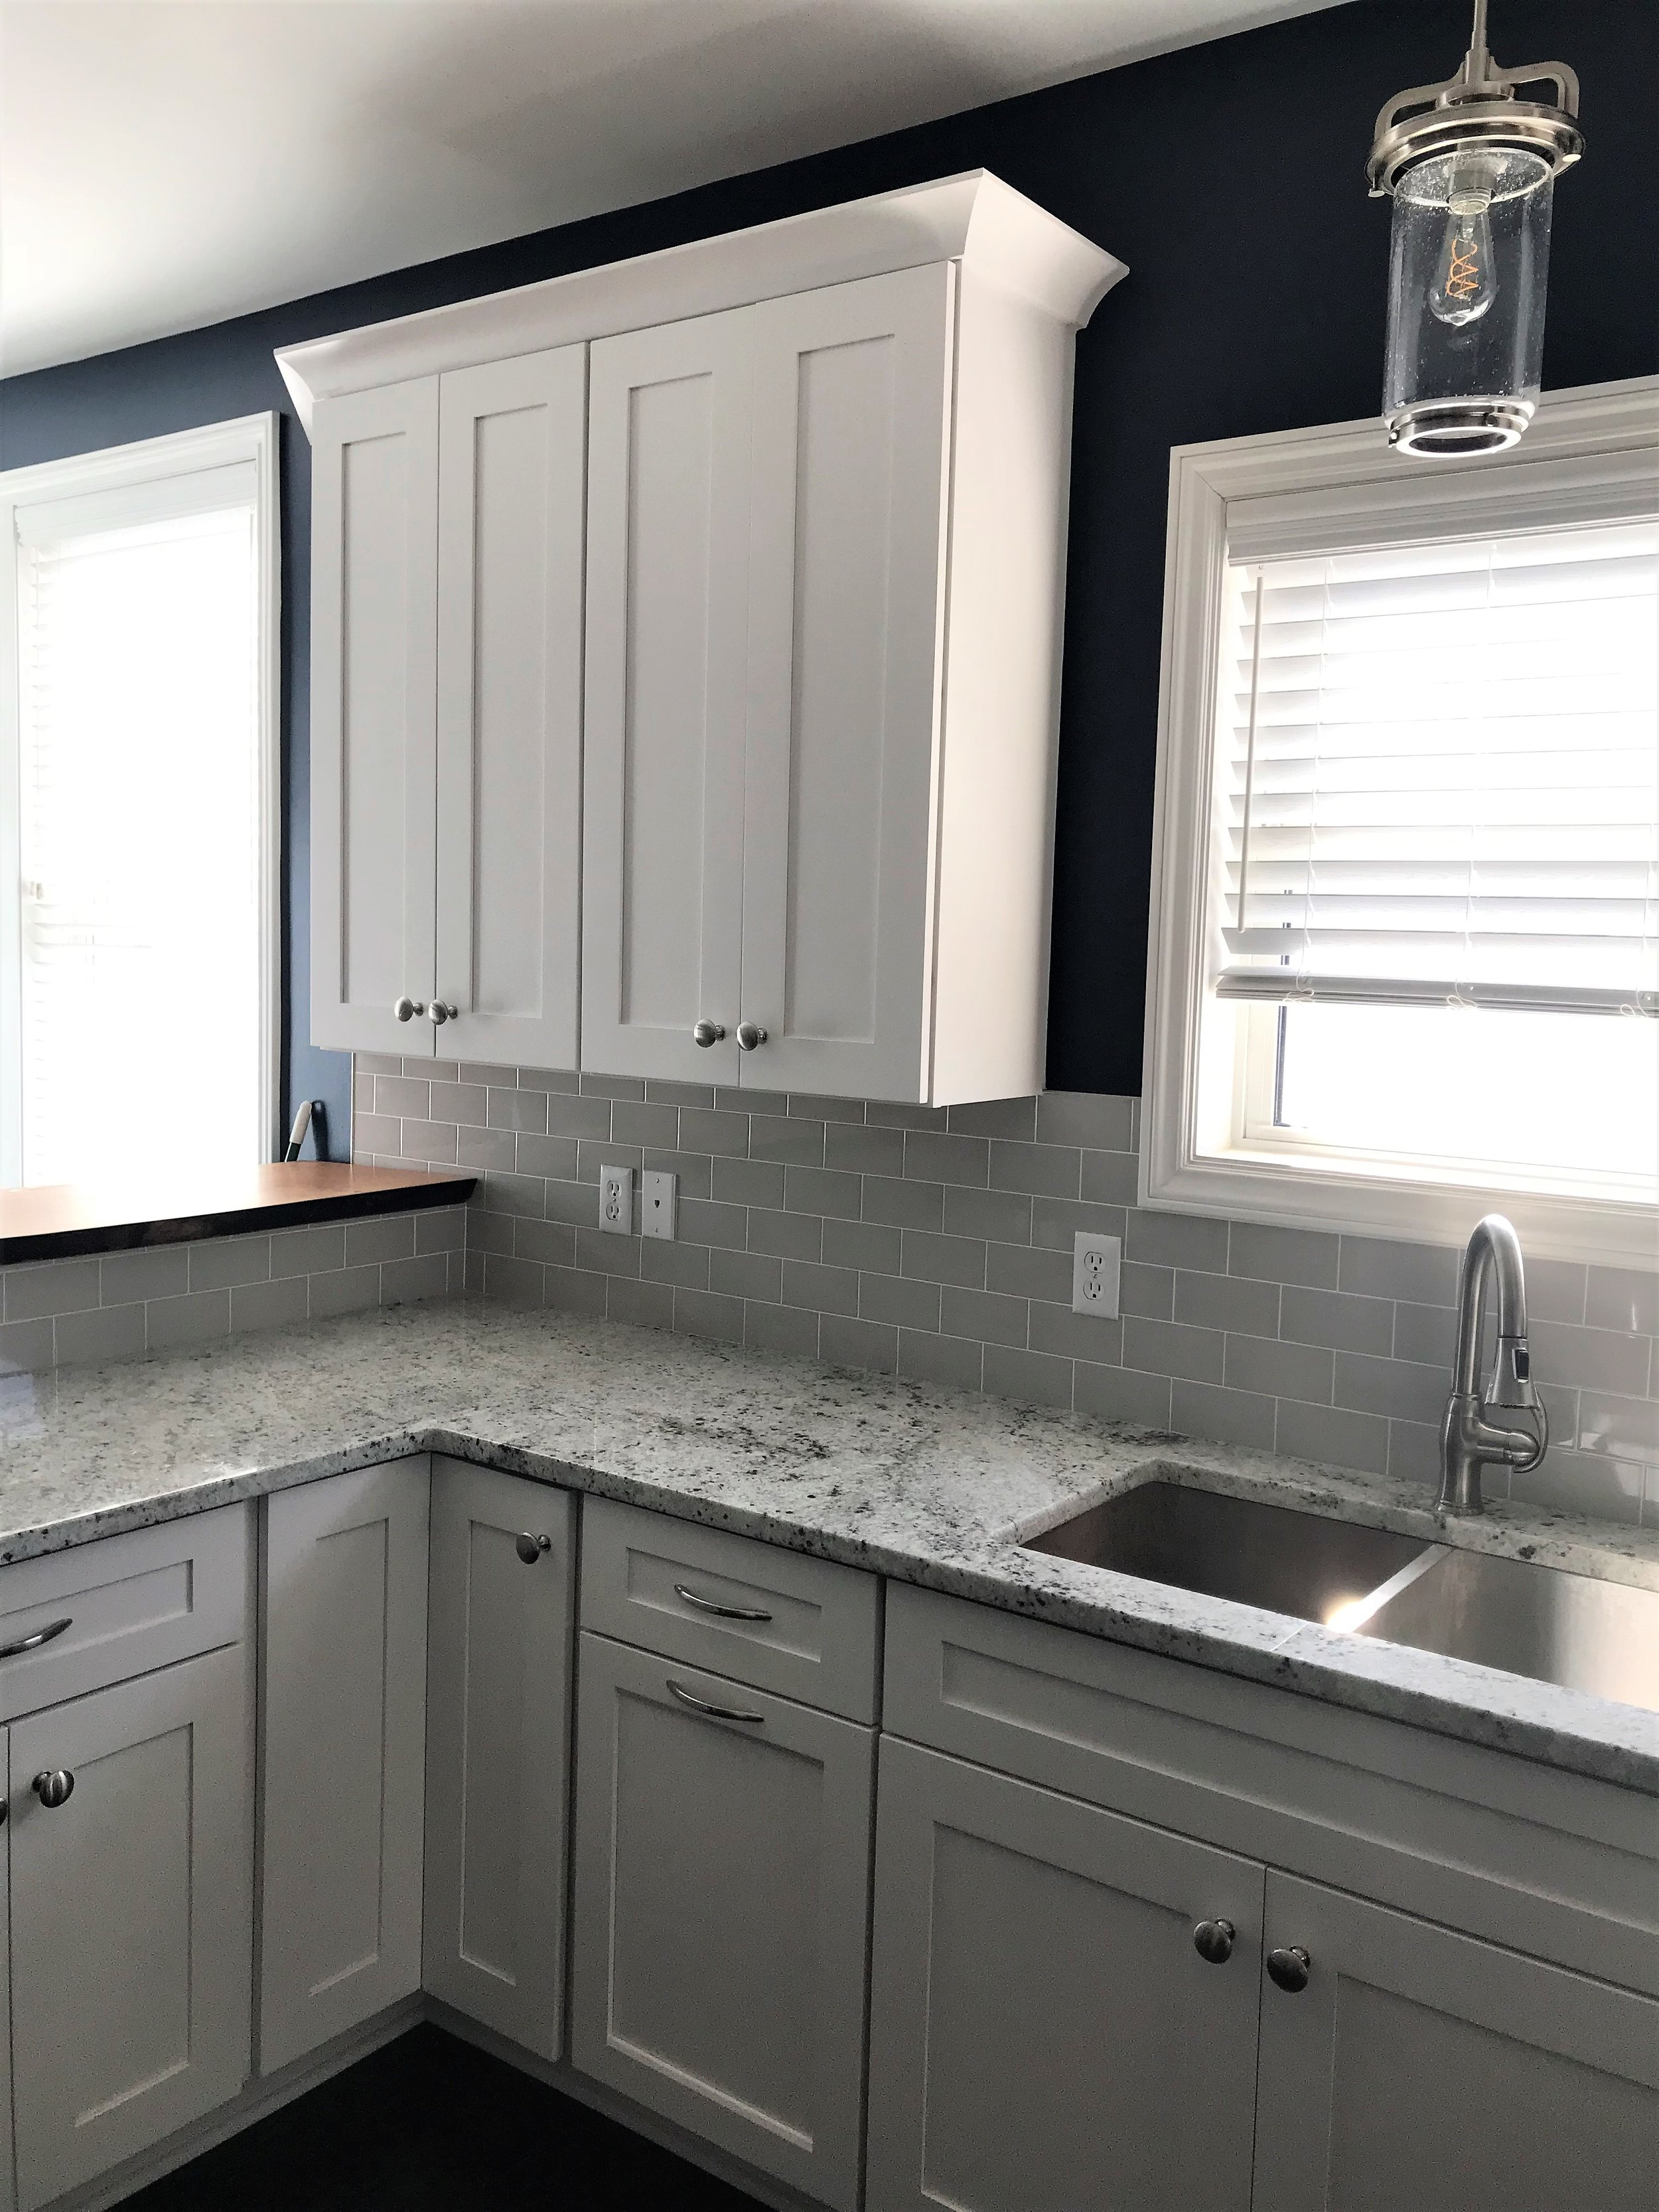 L shaped kitchen Renovation